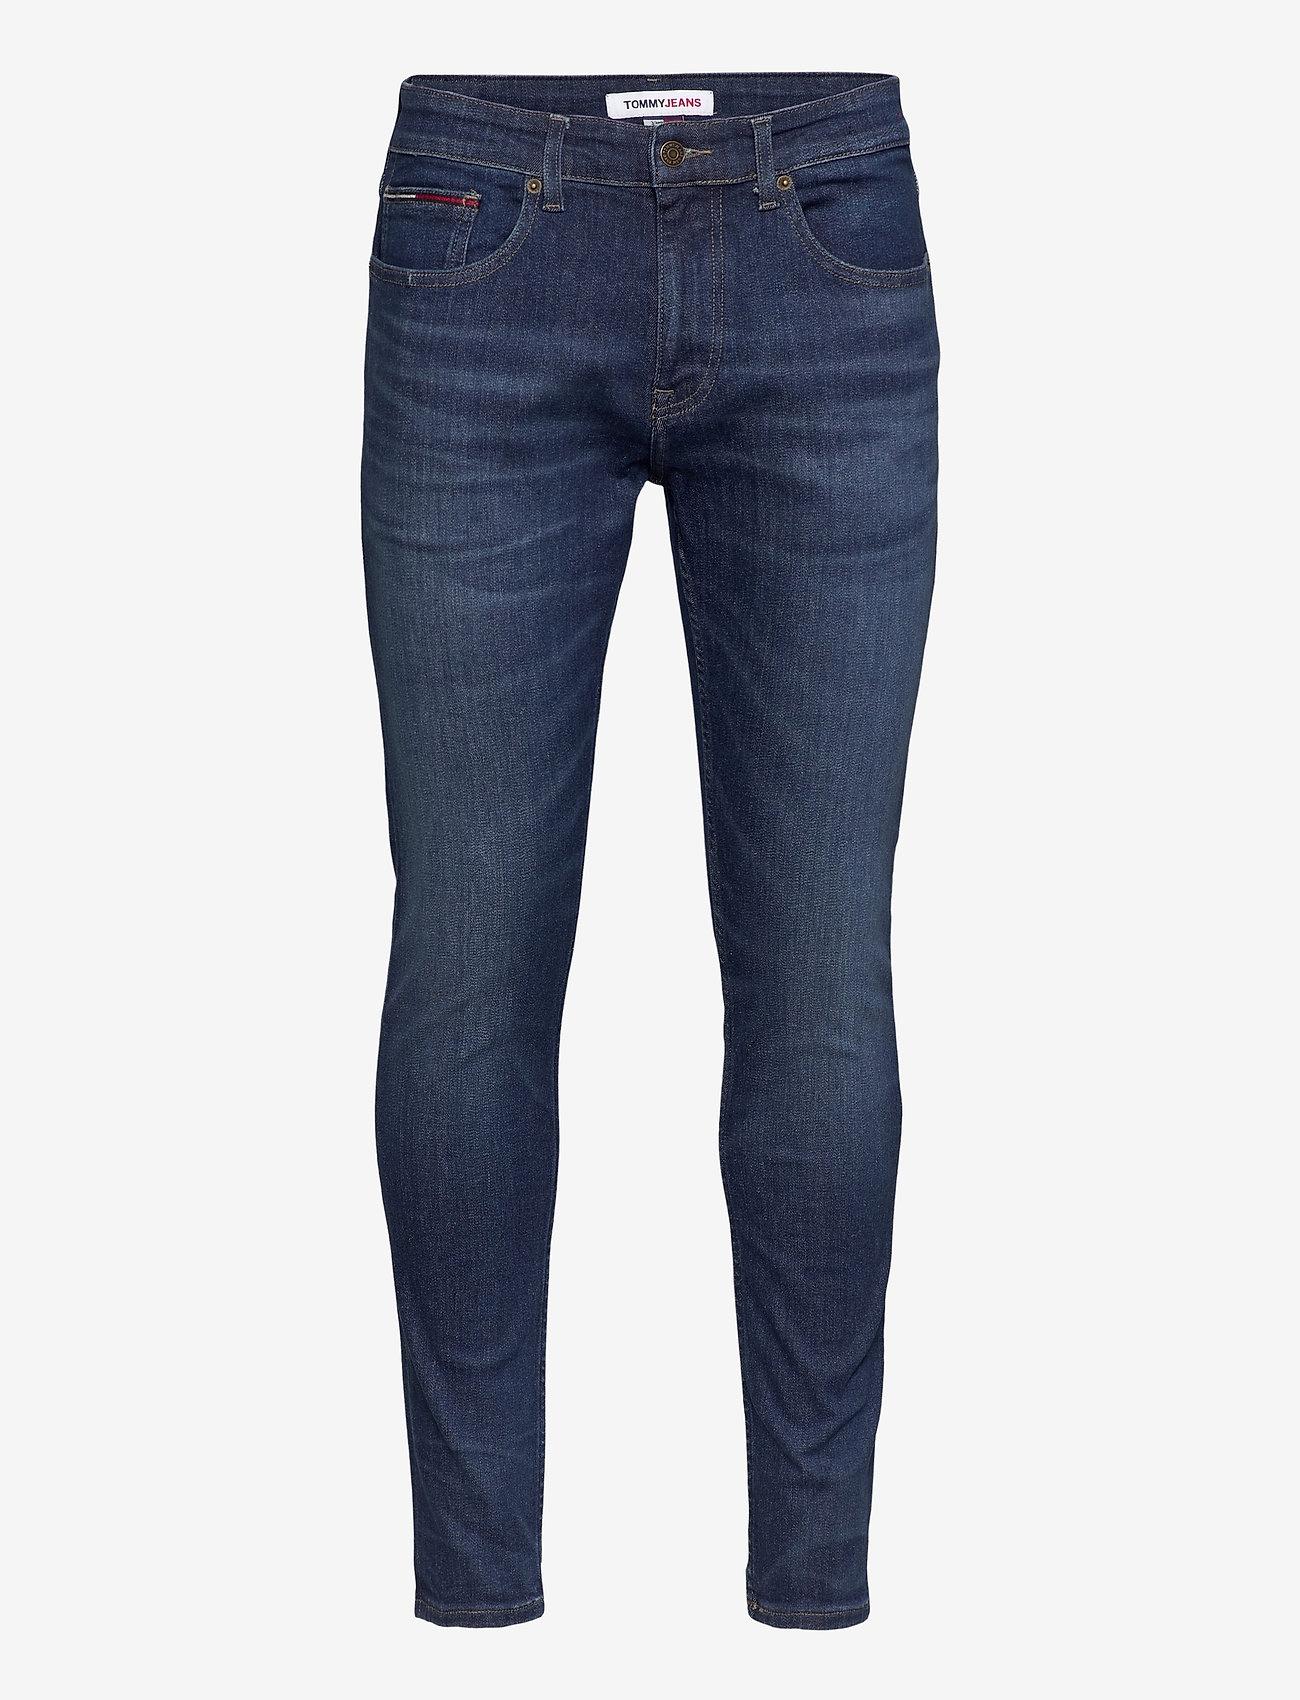 Tommy Jeans - AUSTIN SLIM QDBST - slim jeans - queens dark blue str - 0